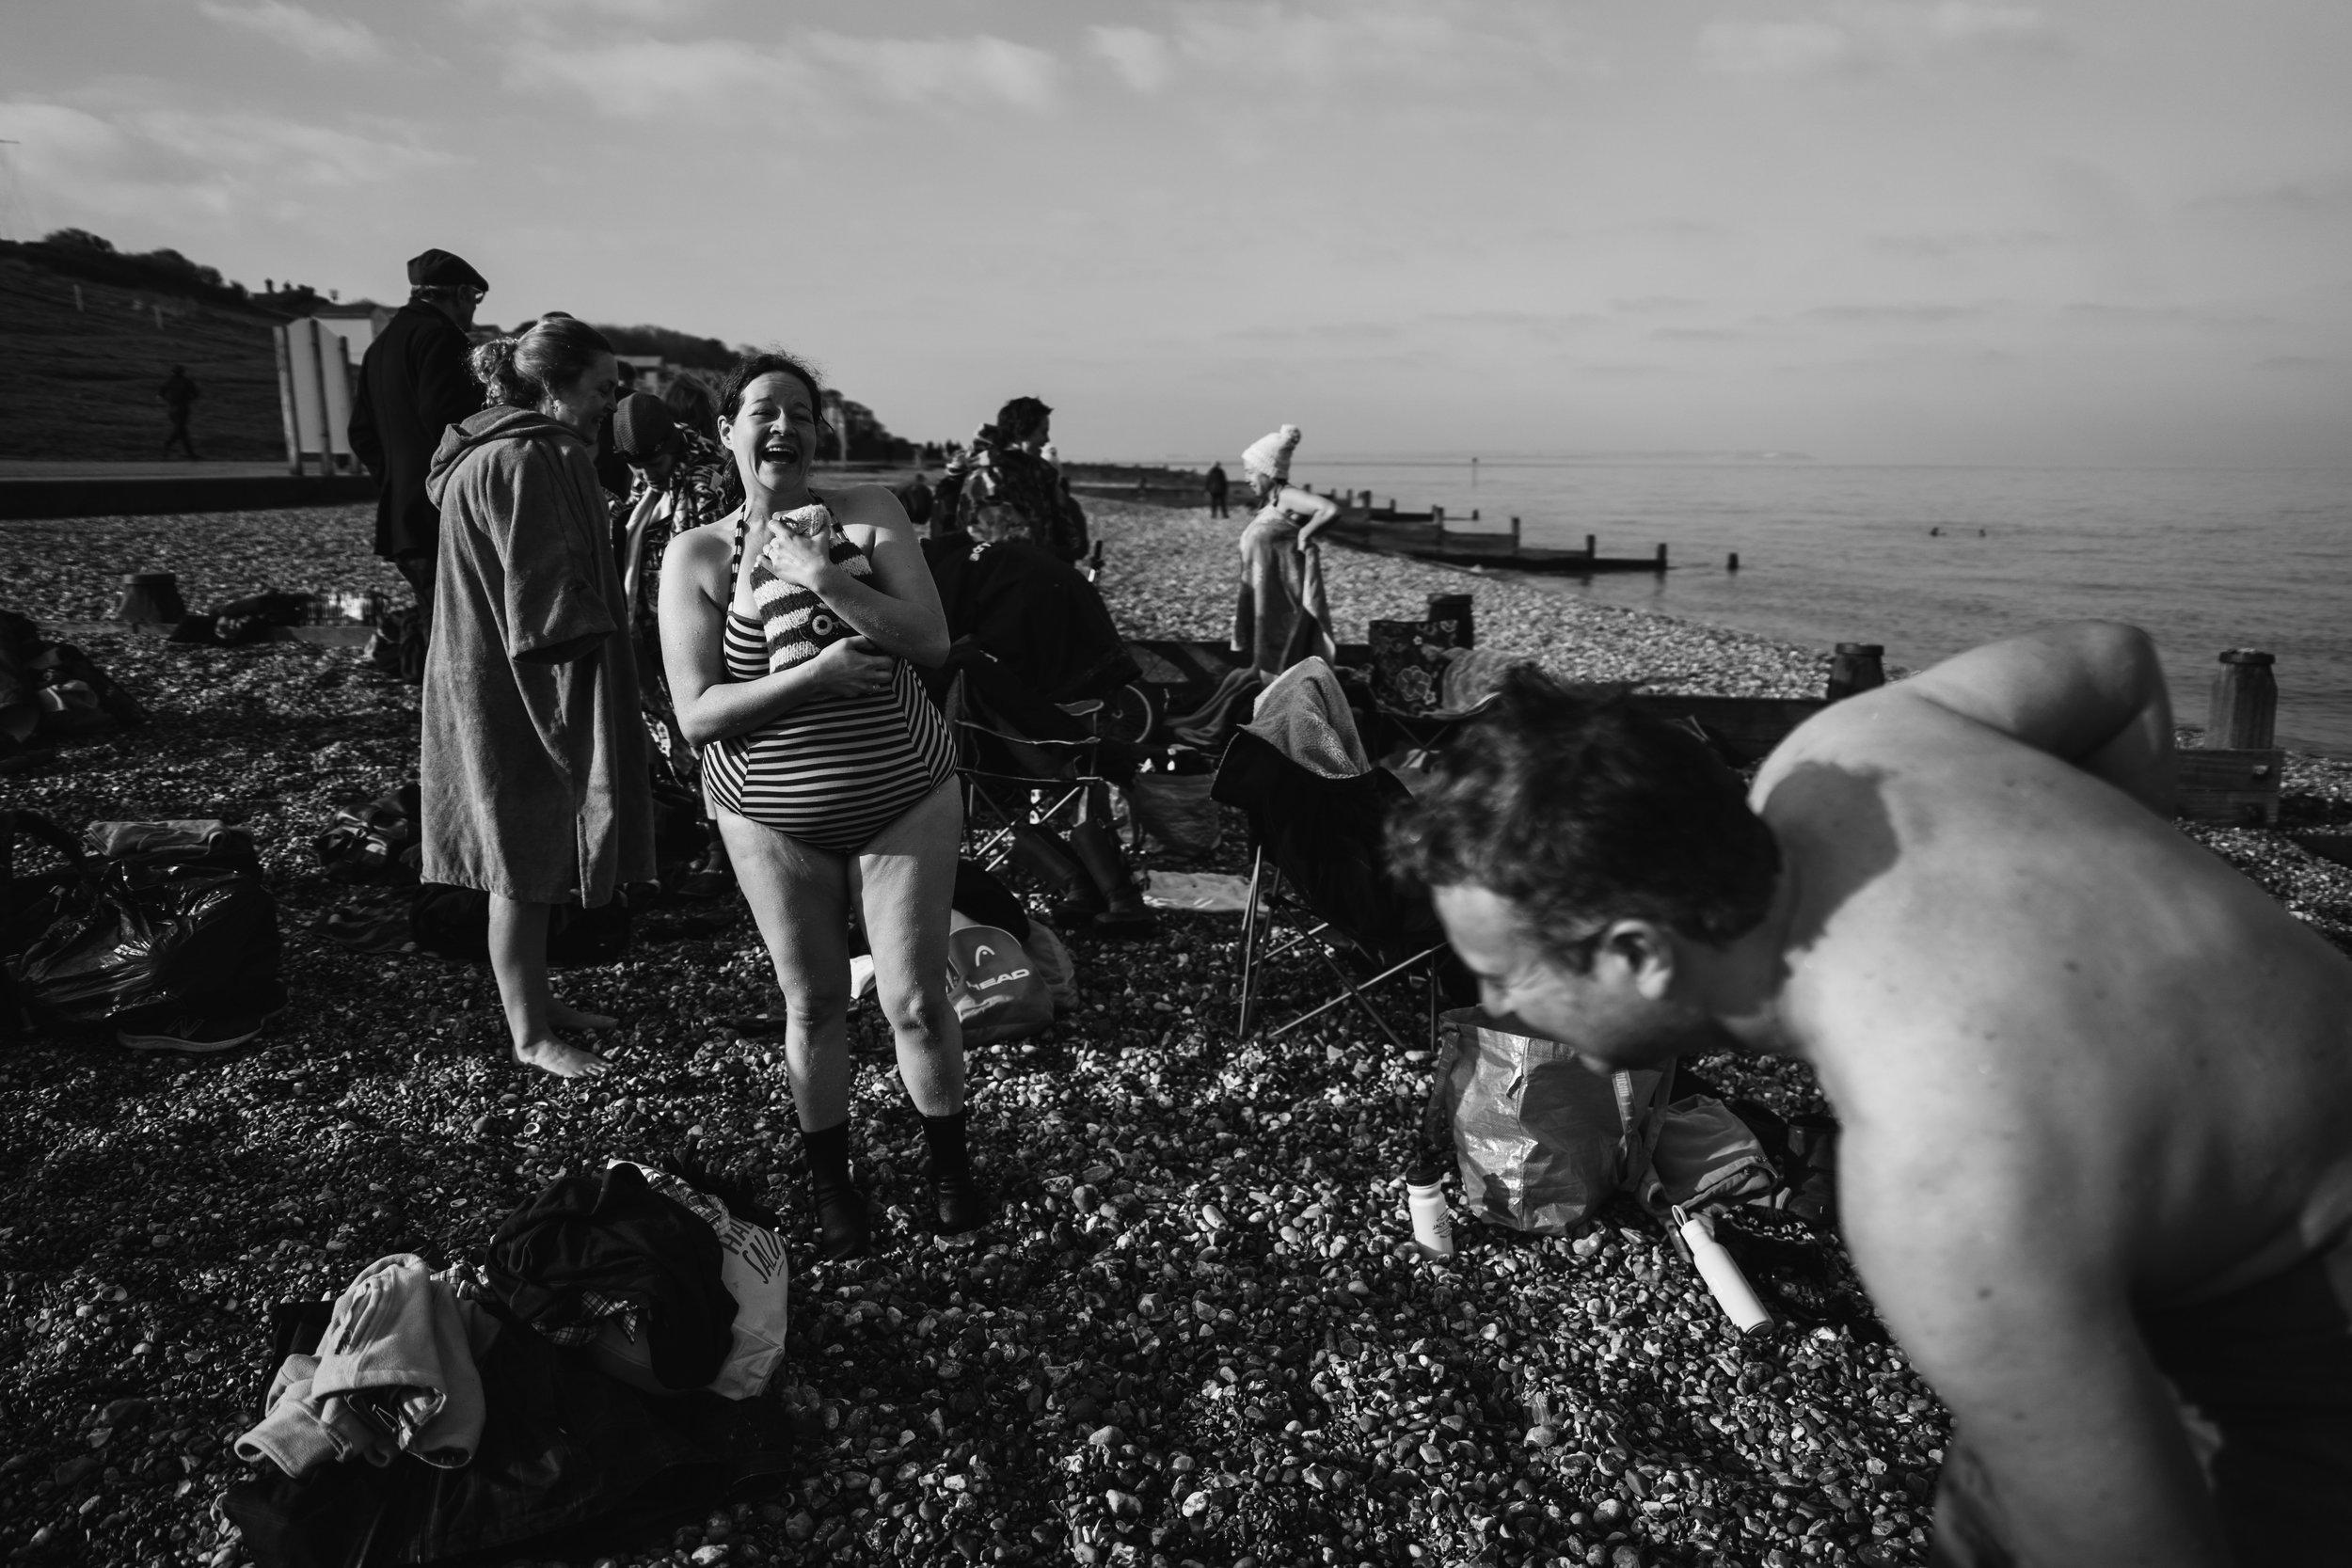 kent-sea-swimmers-103225.jpg